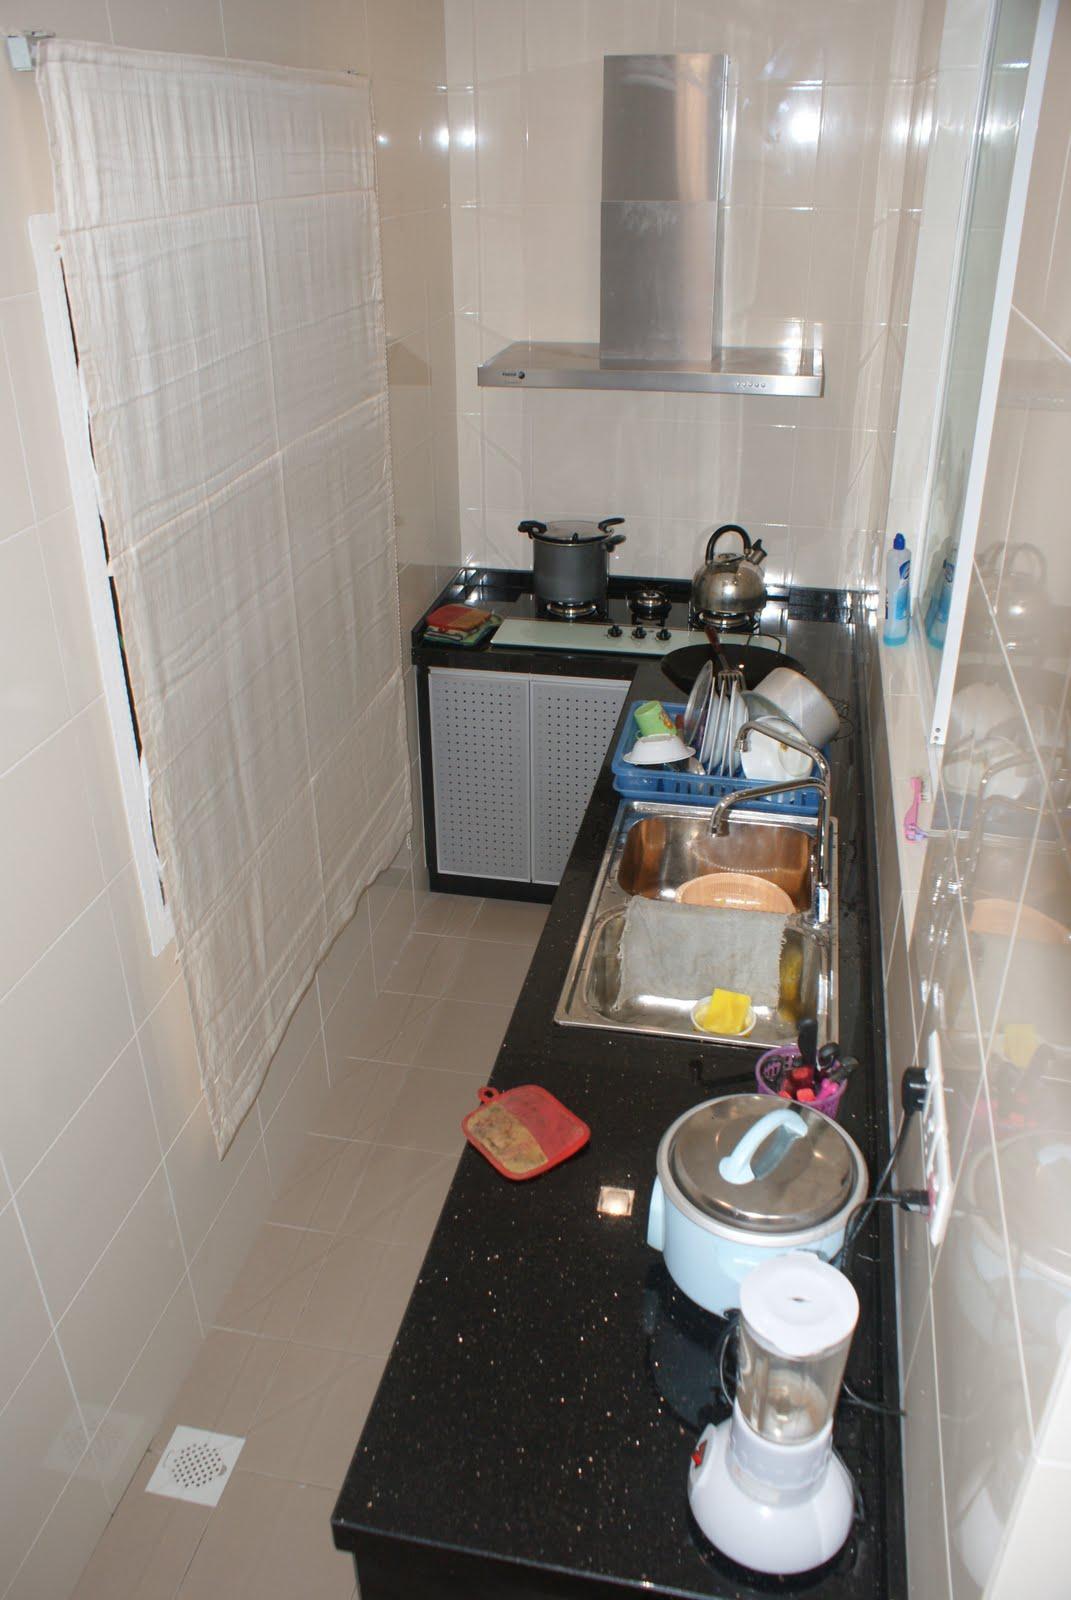 Hood + Hob @ wet kitchen..